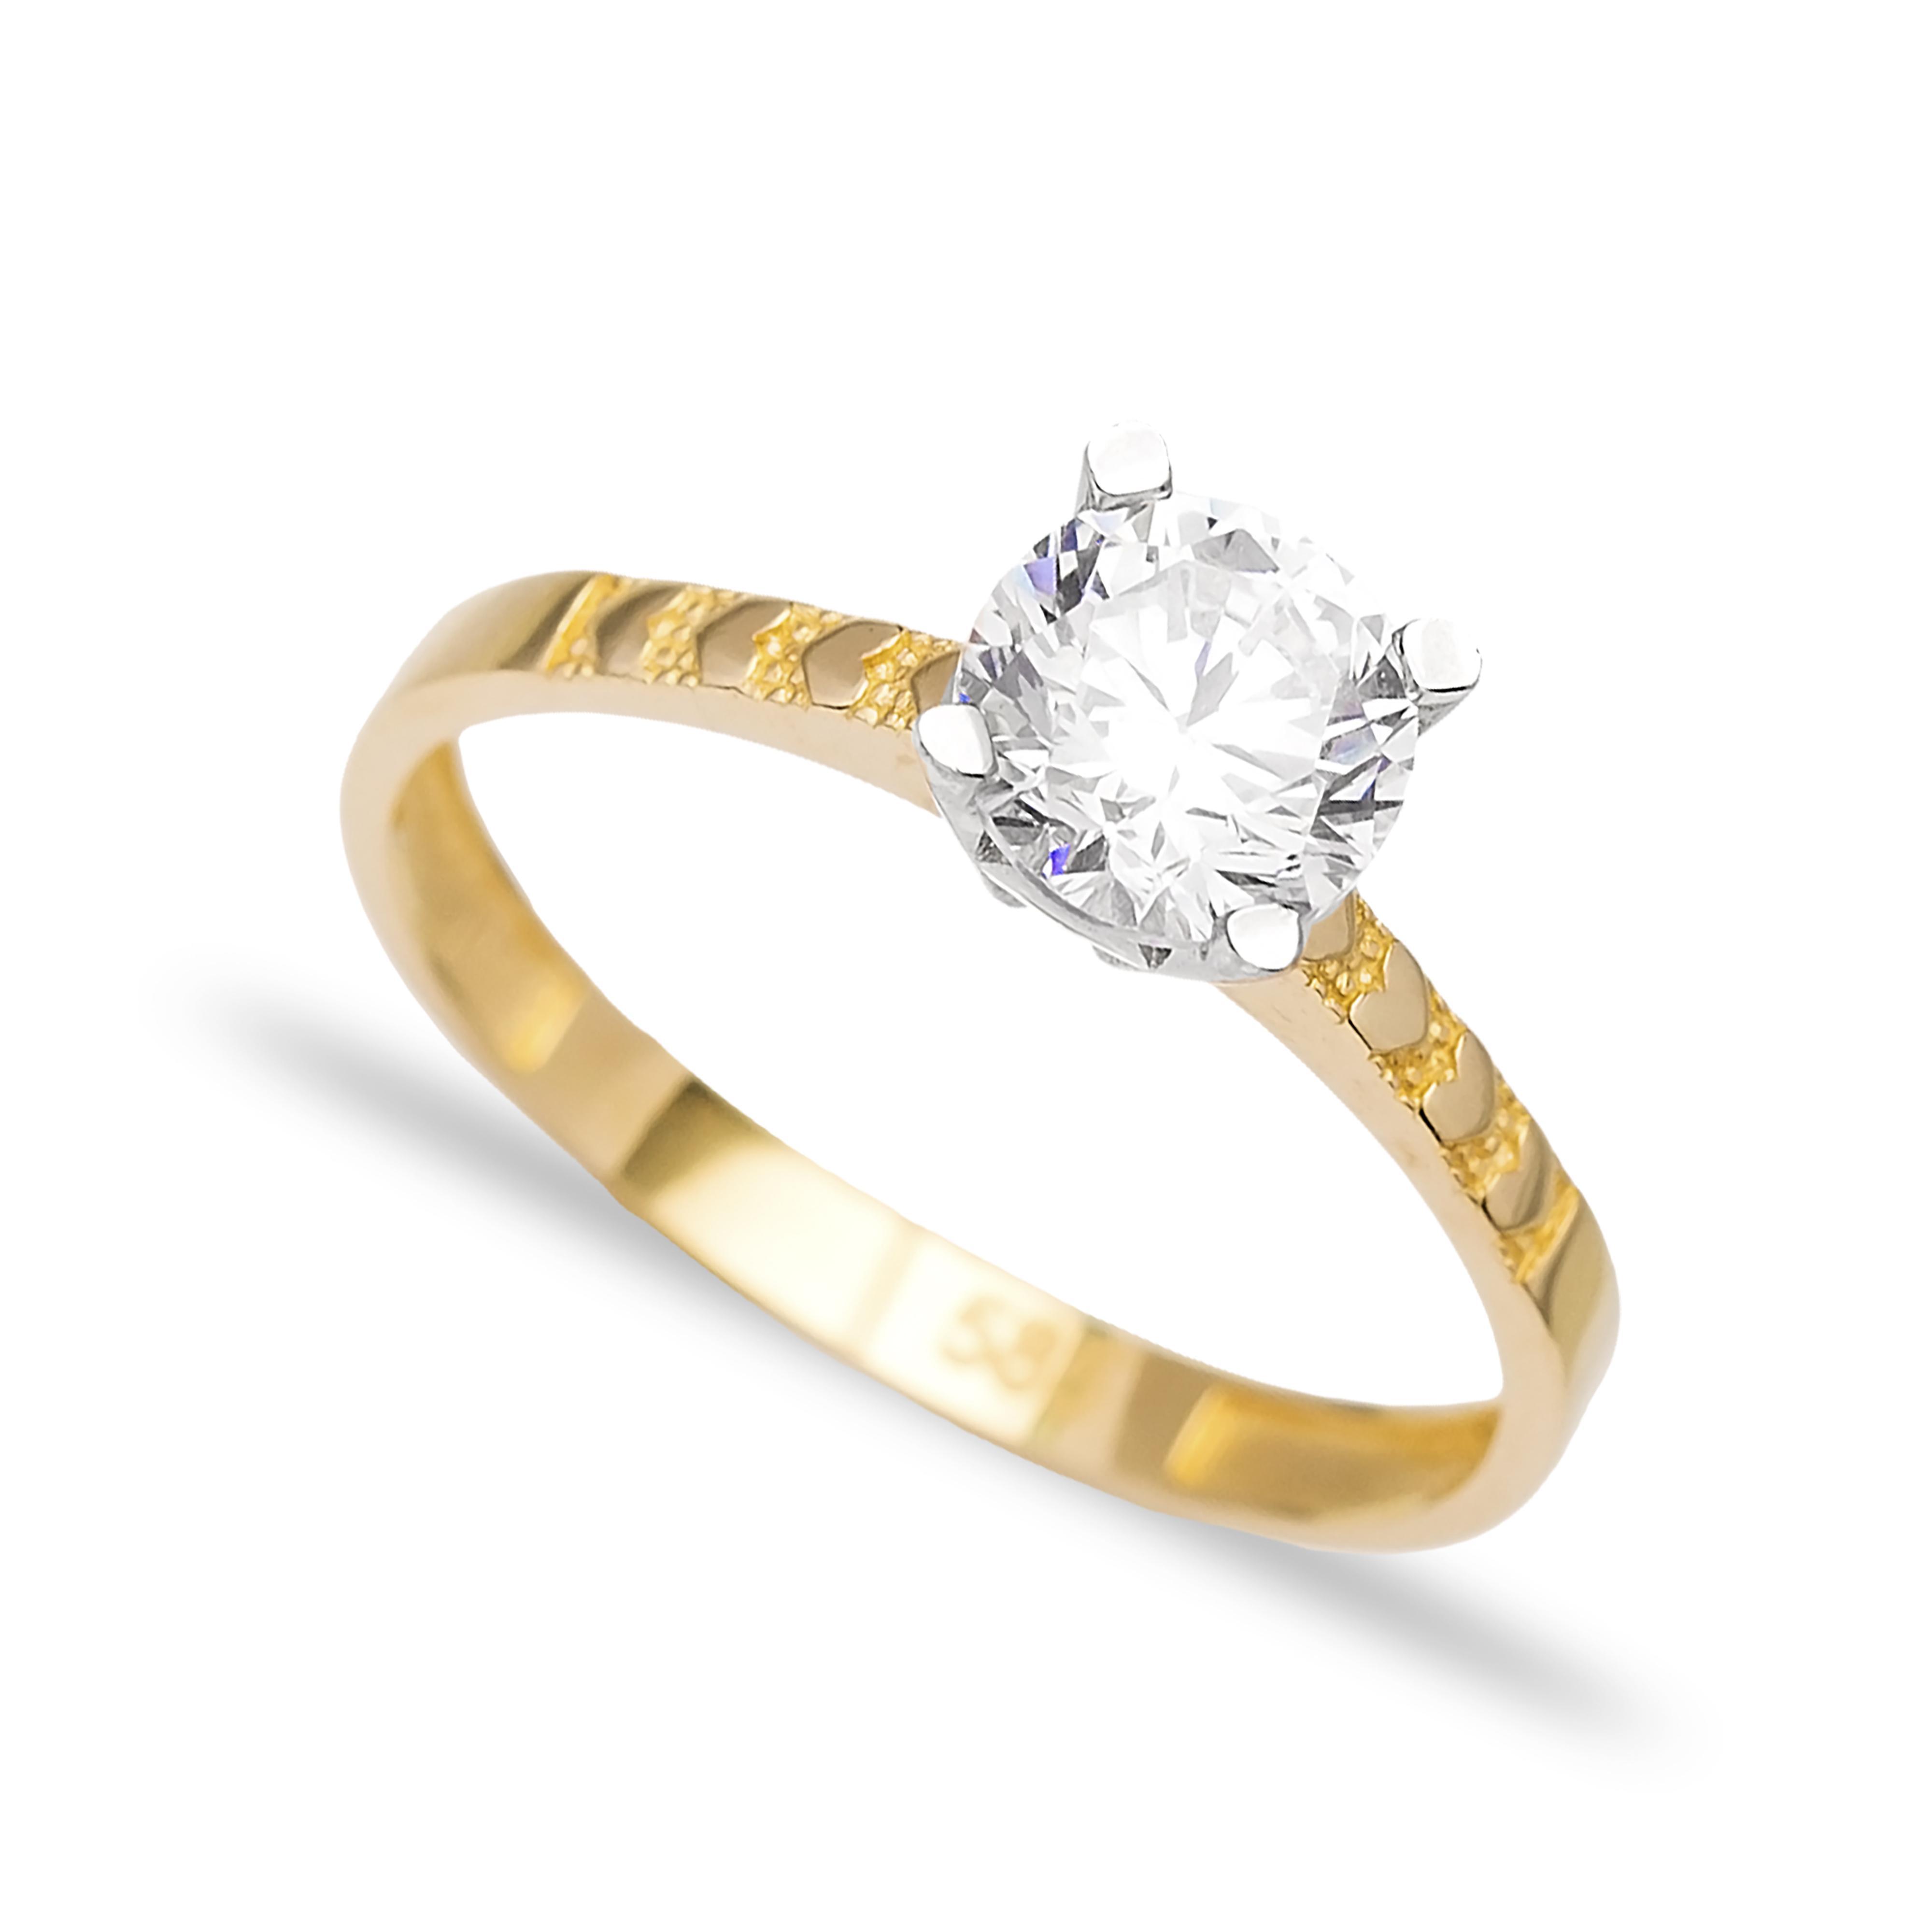 Engagement Solitaire 14 Karat Gold Zirconia 7mm Wholesale Handmade Turkish Jewelry